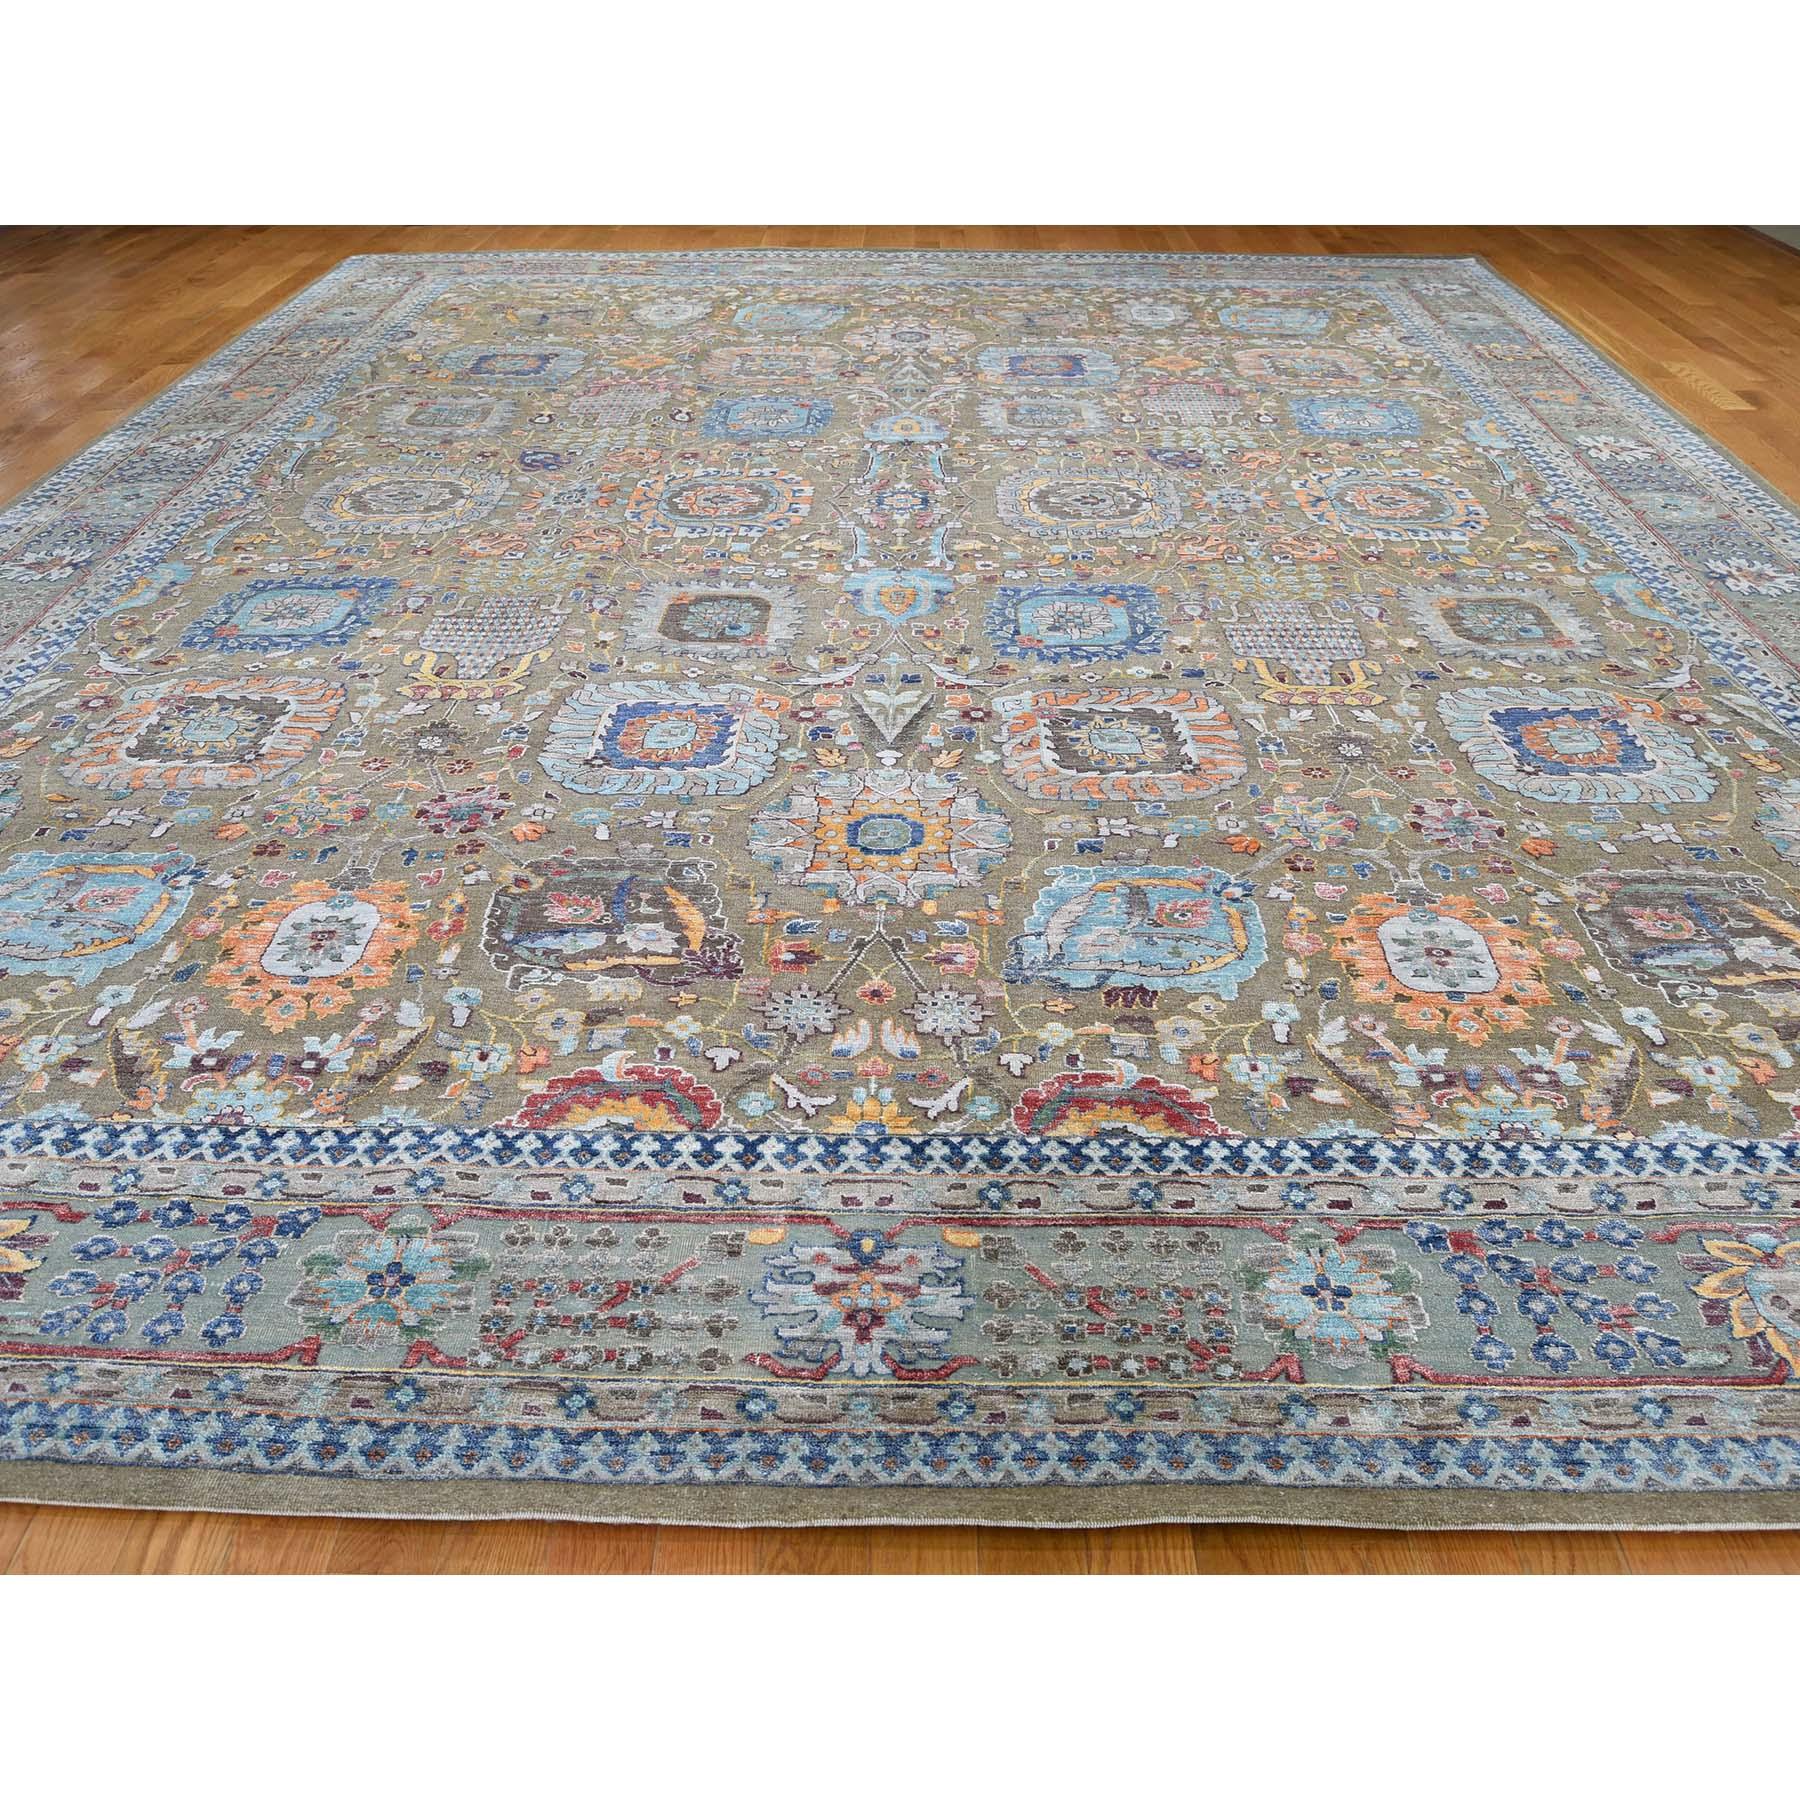 11-9 x15-2  Antiqued Tabriz Hi-Lo Pile Silk With Oxidized Wool Oversize Oriental Rug